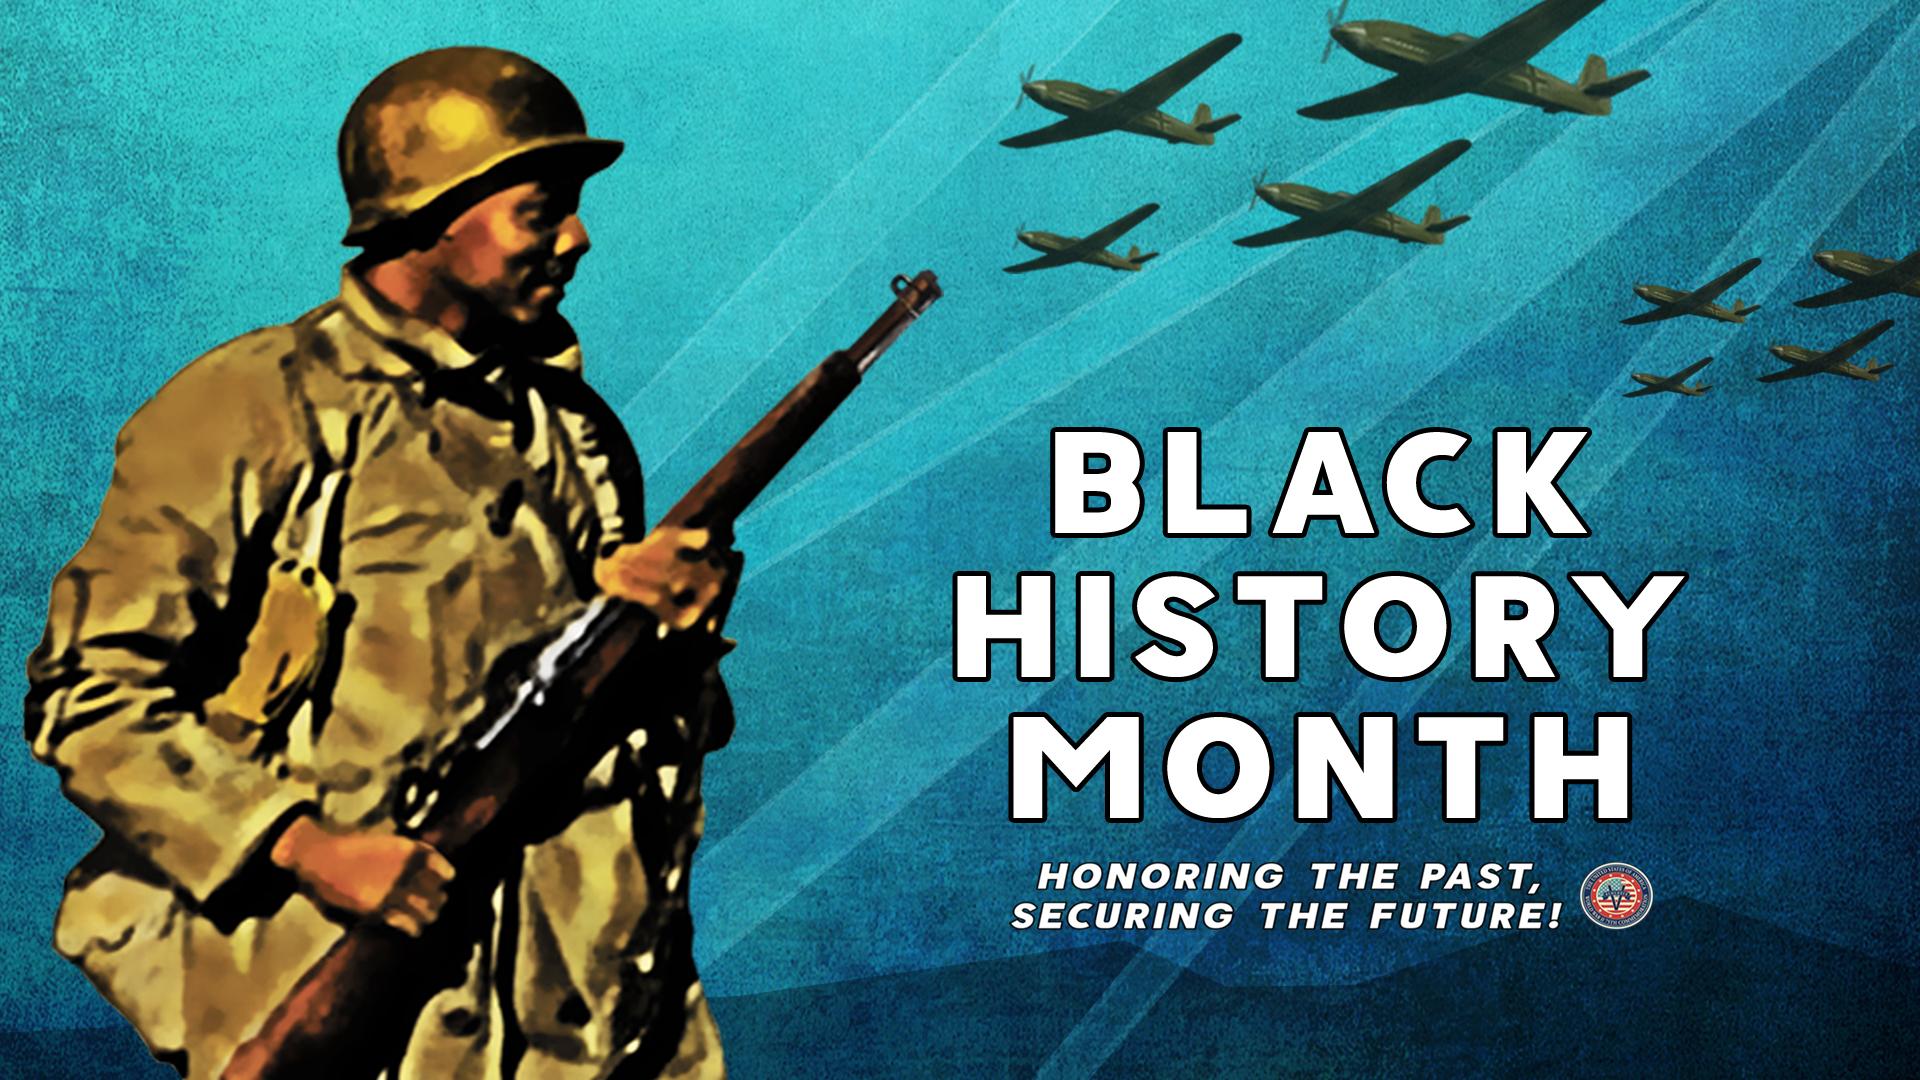 Black History Month 2020 1920x1080